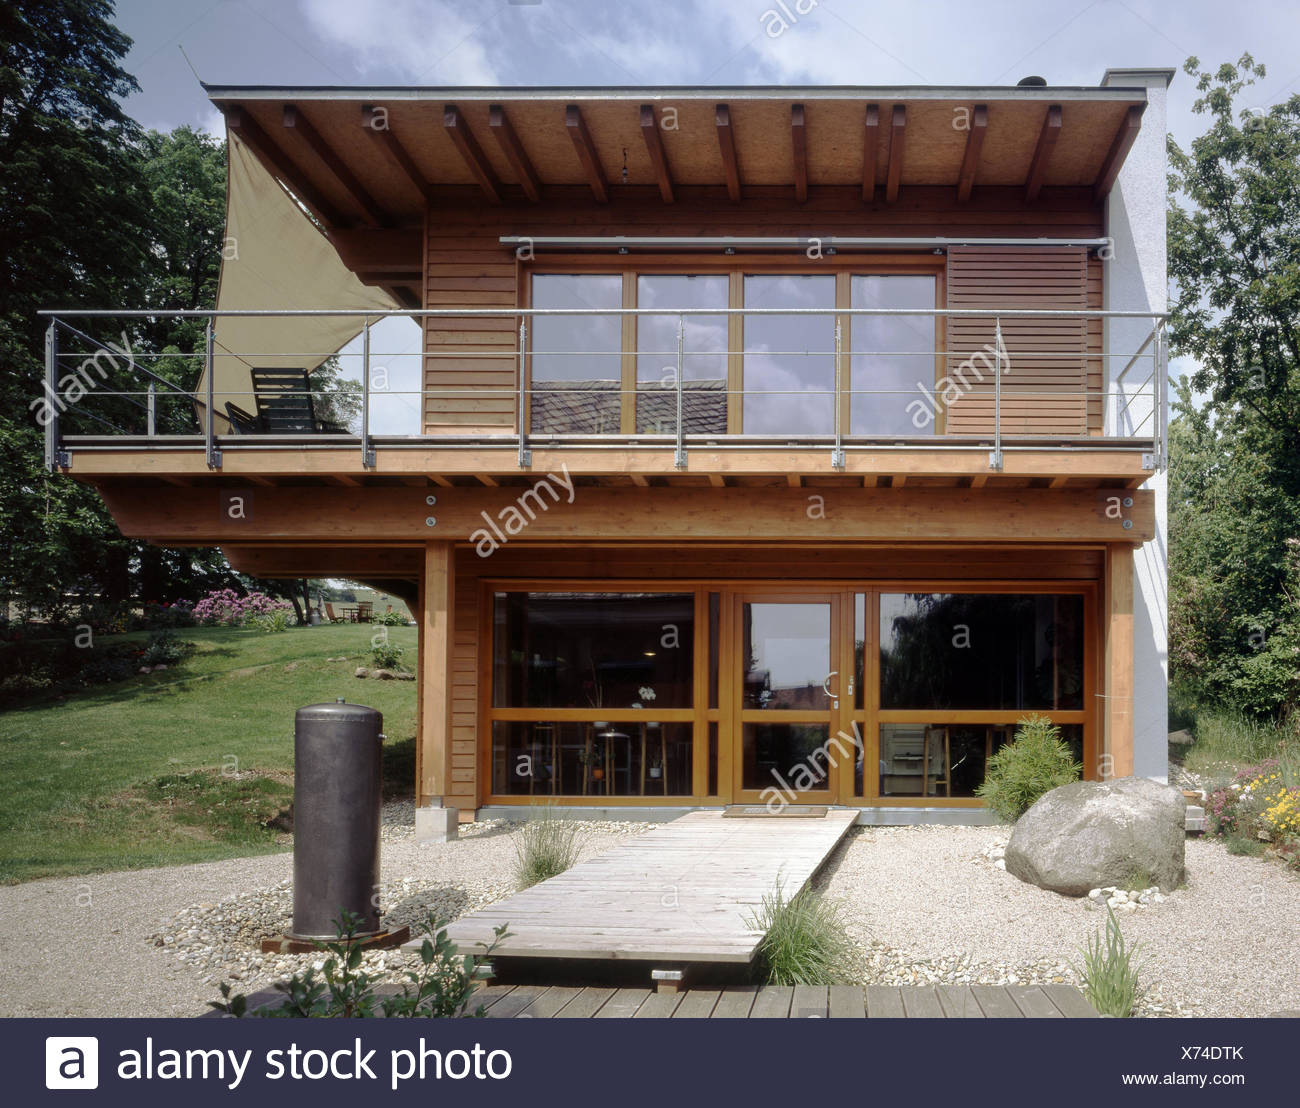 residential house outside flat